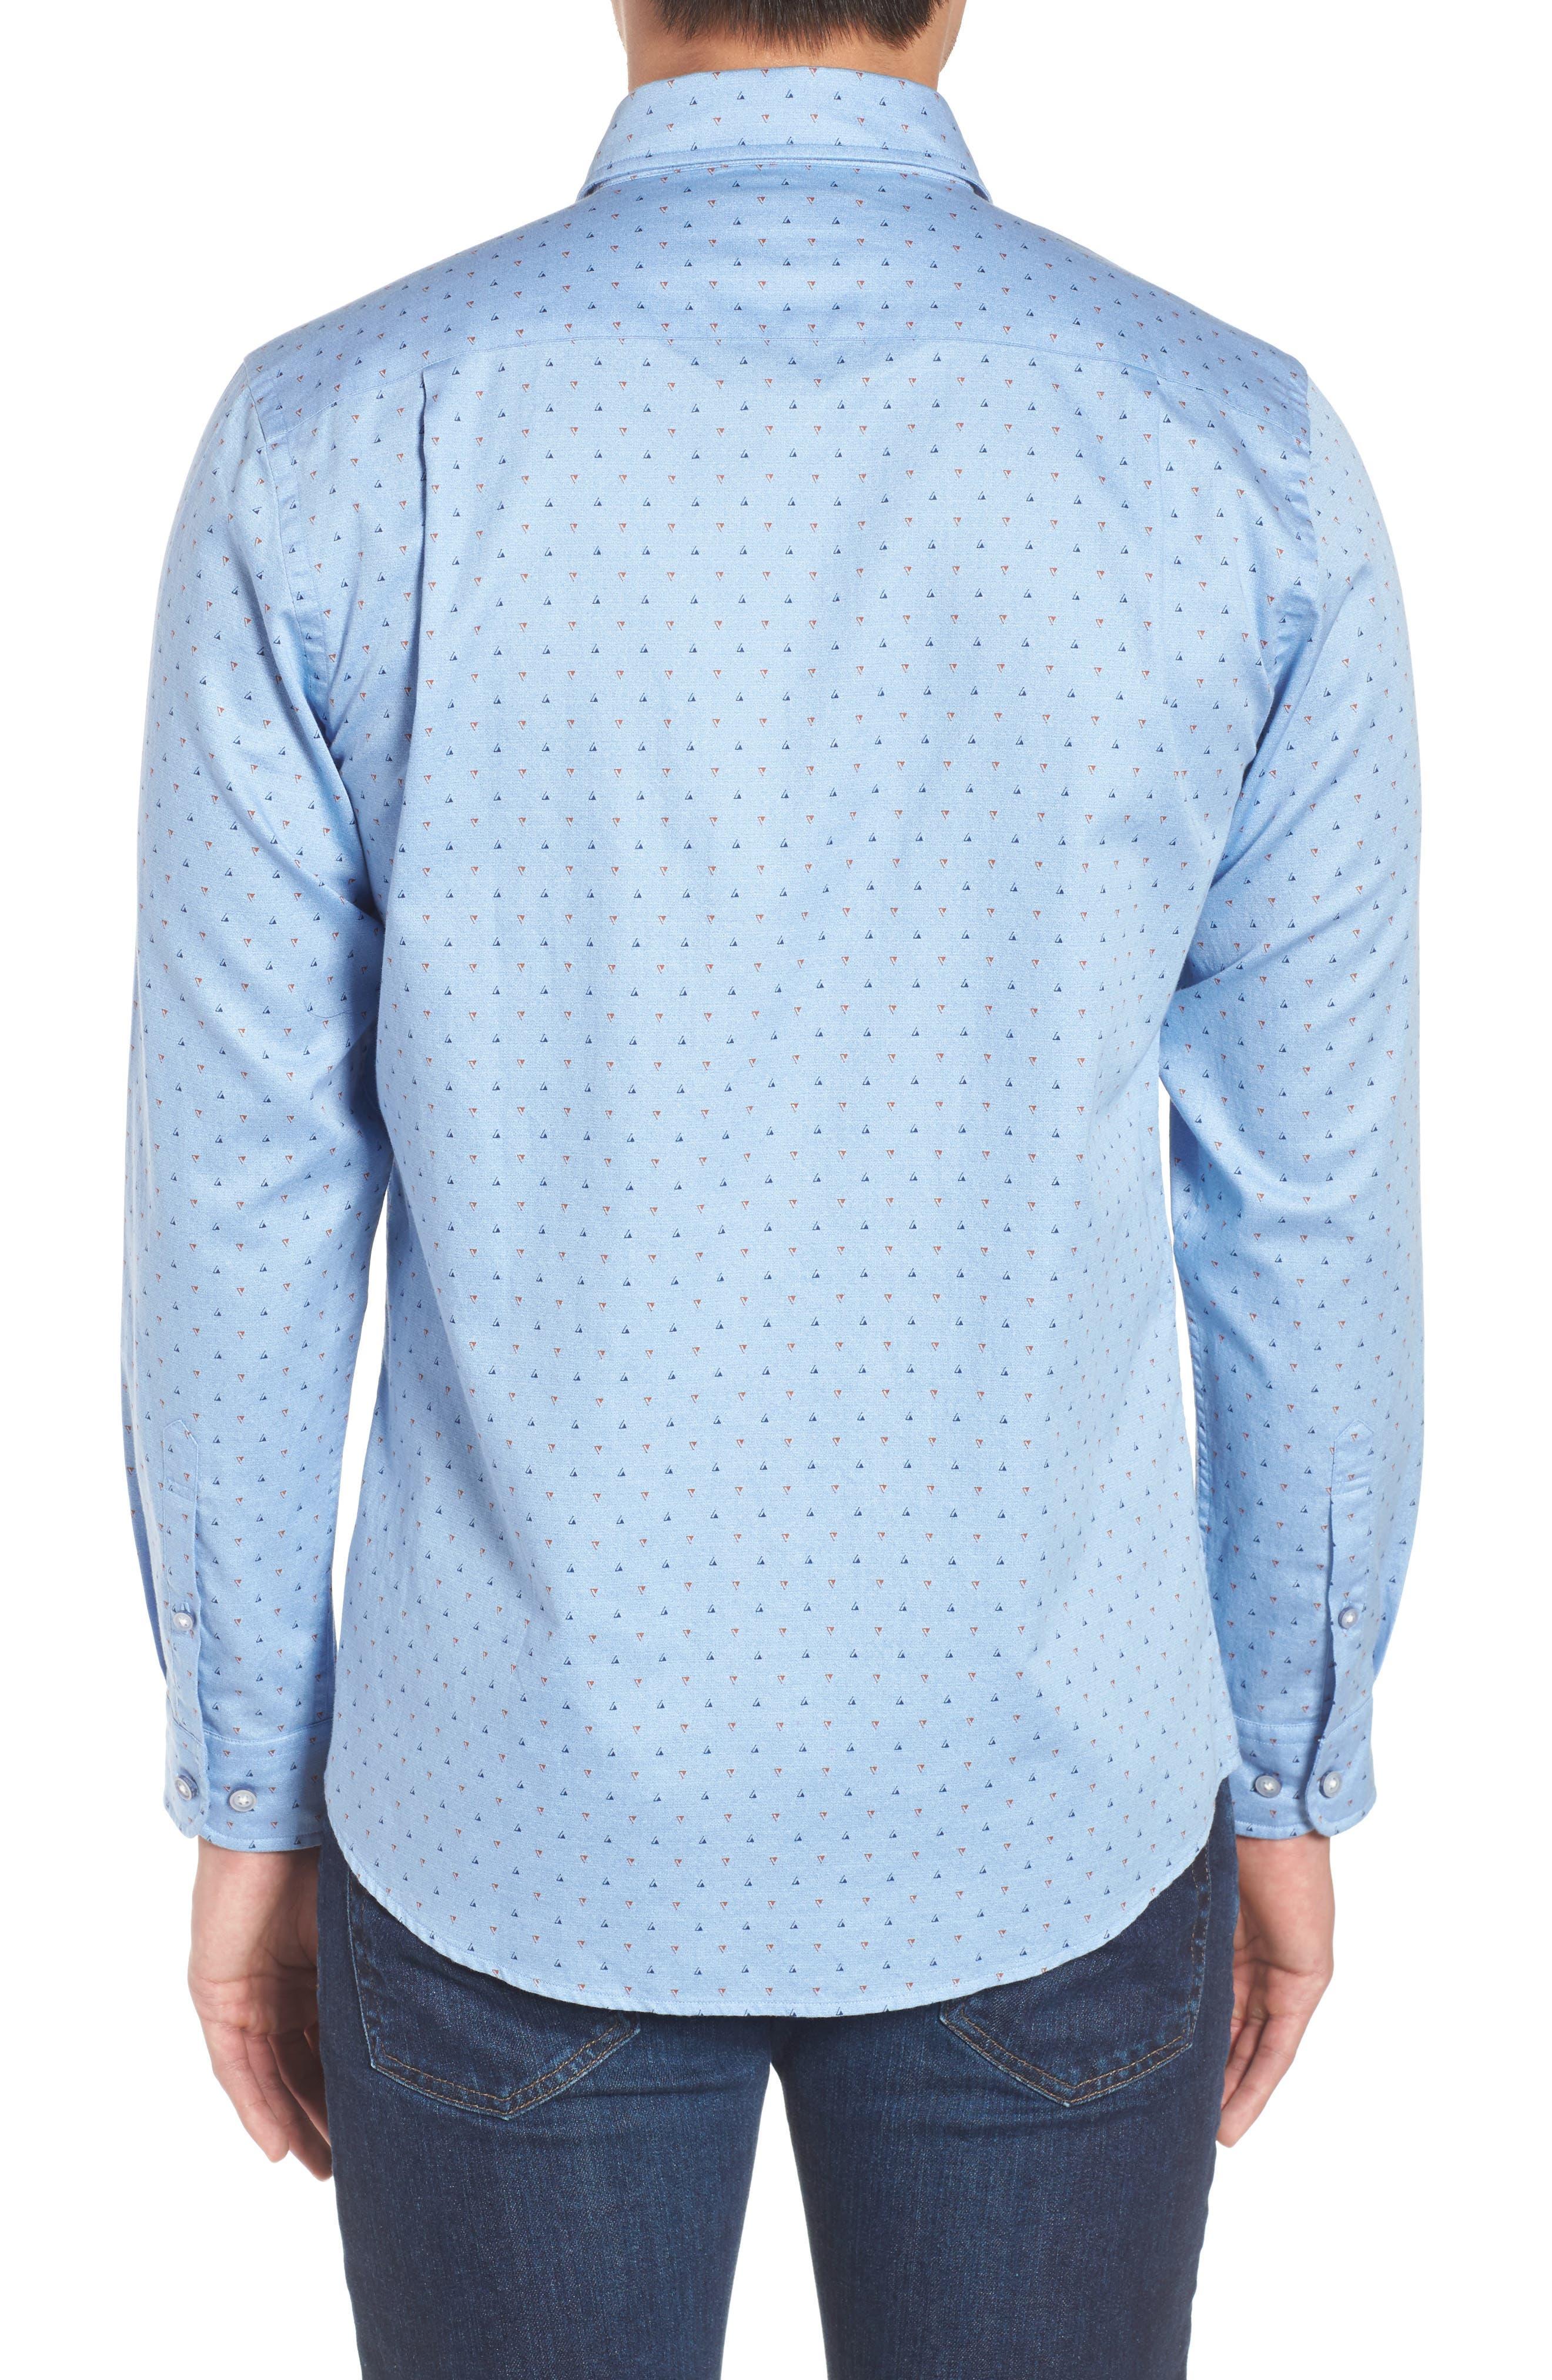 Penzance Regular Fit Sport Shirt,                             Alternate thumbnail 2, color,                             456